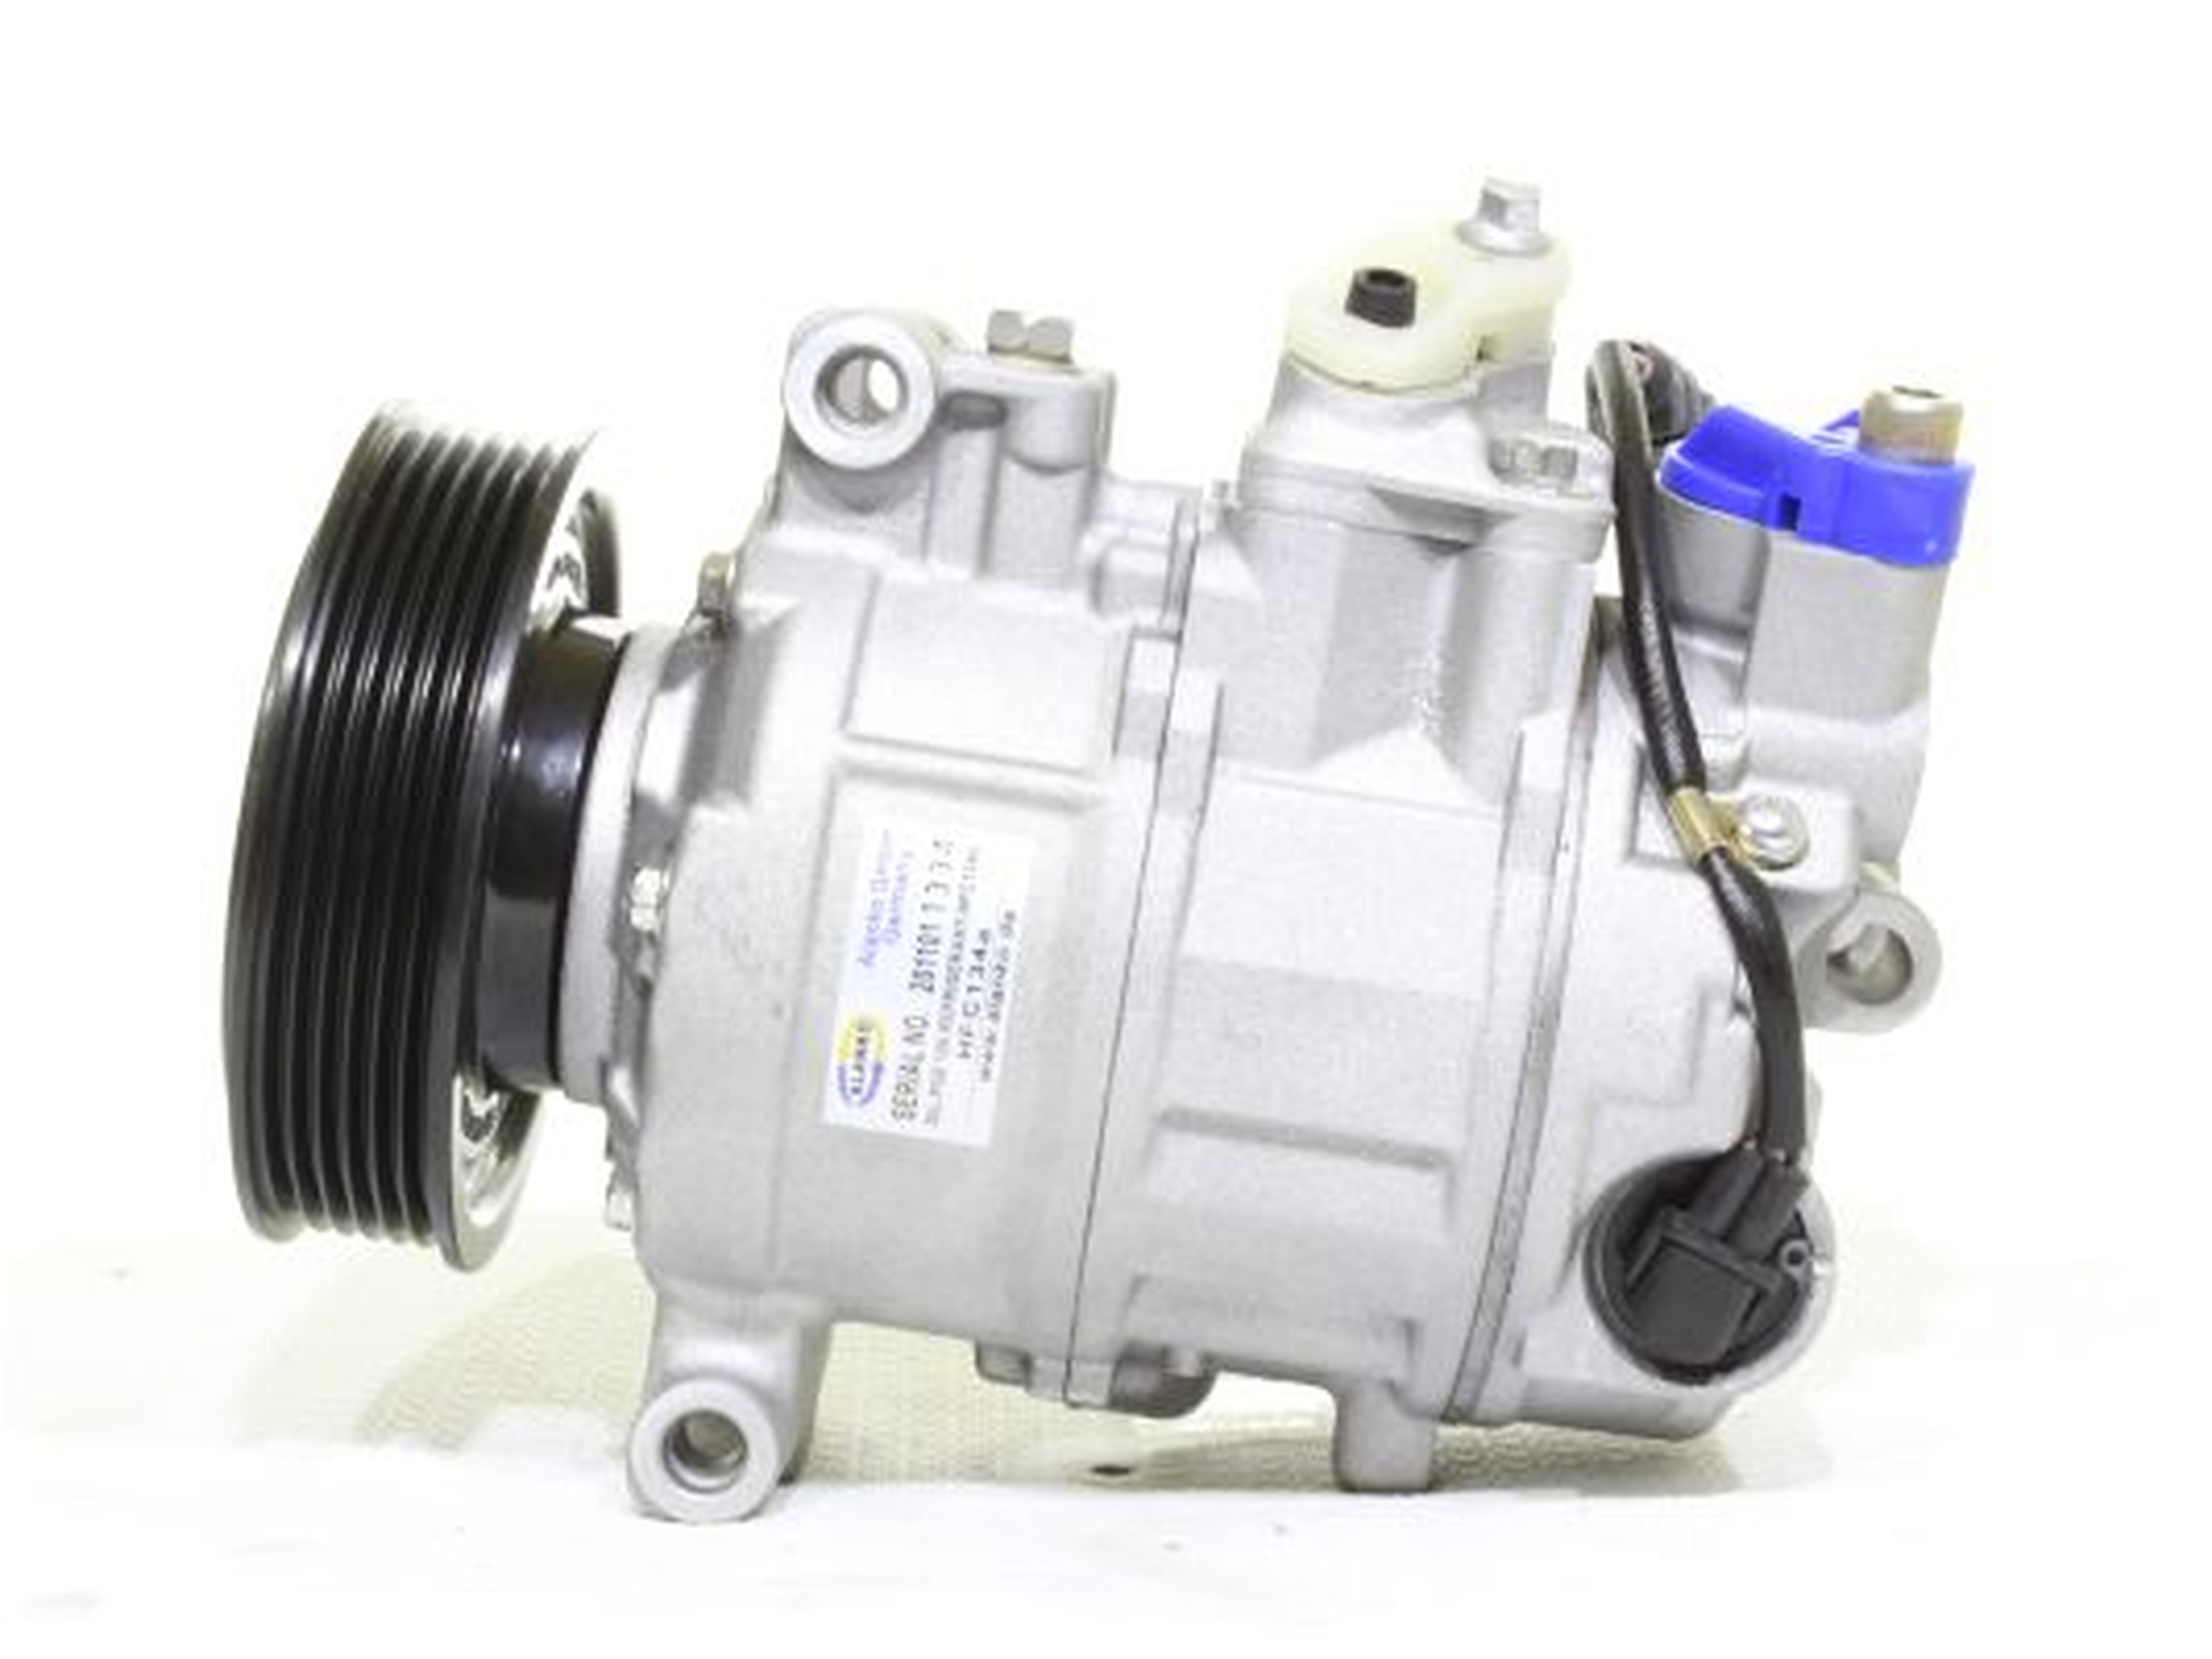 10550777 Kompressor, Klimaanlage ALANKO 550777 - Große Auswahl - stark reduziert